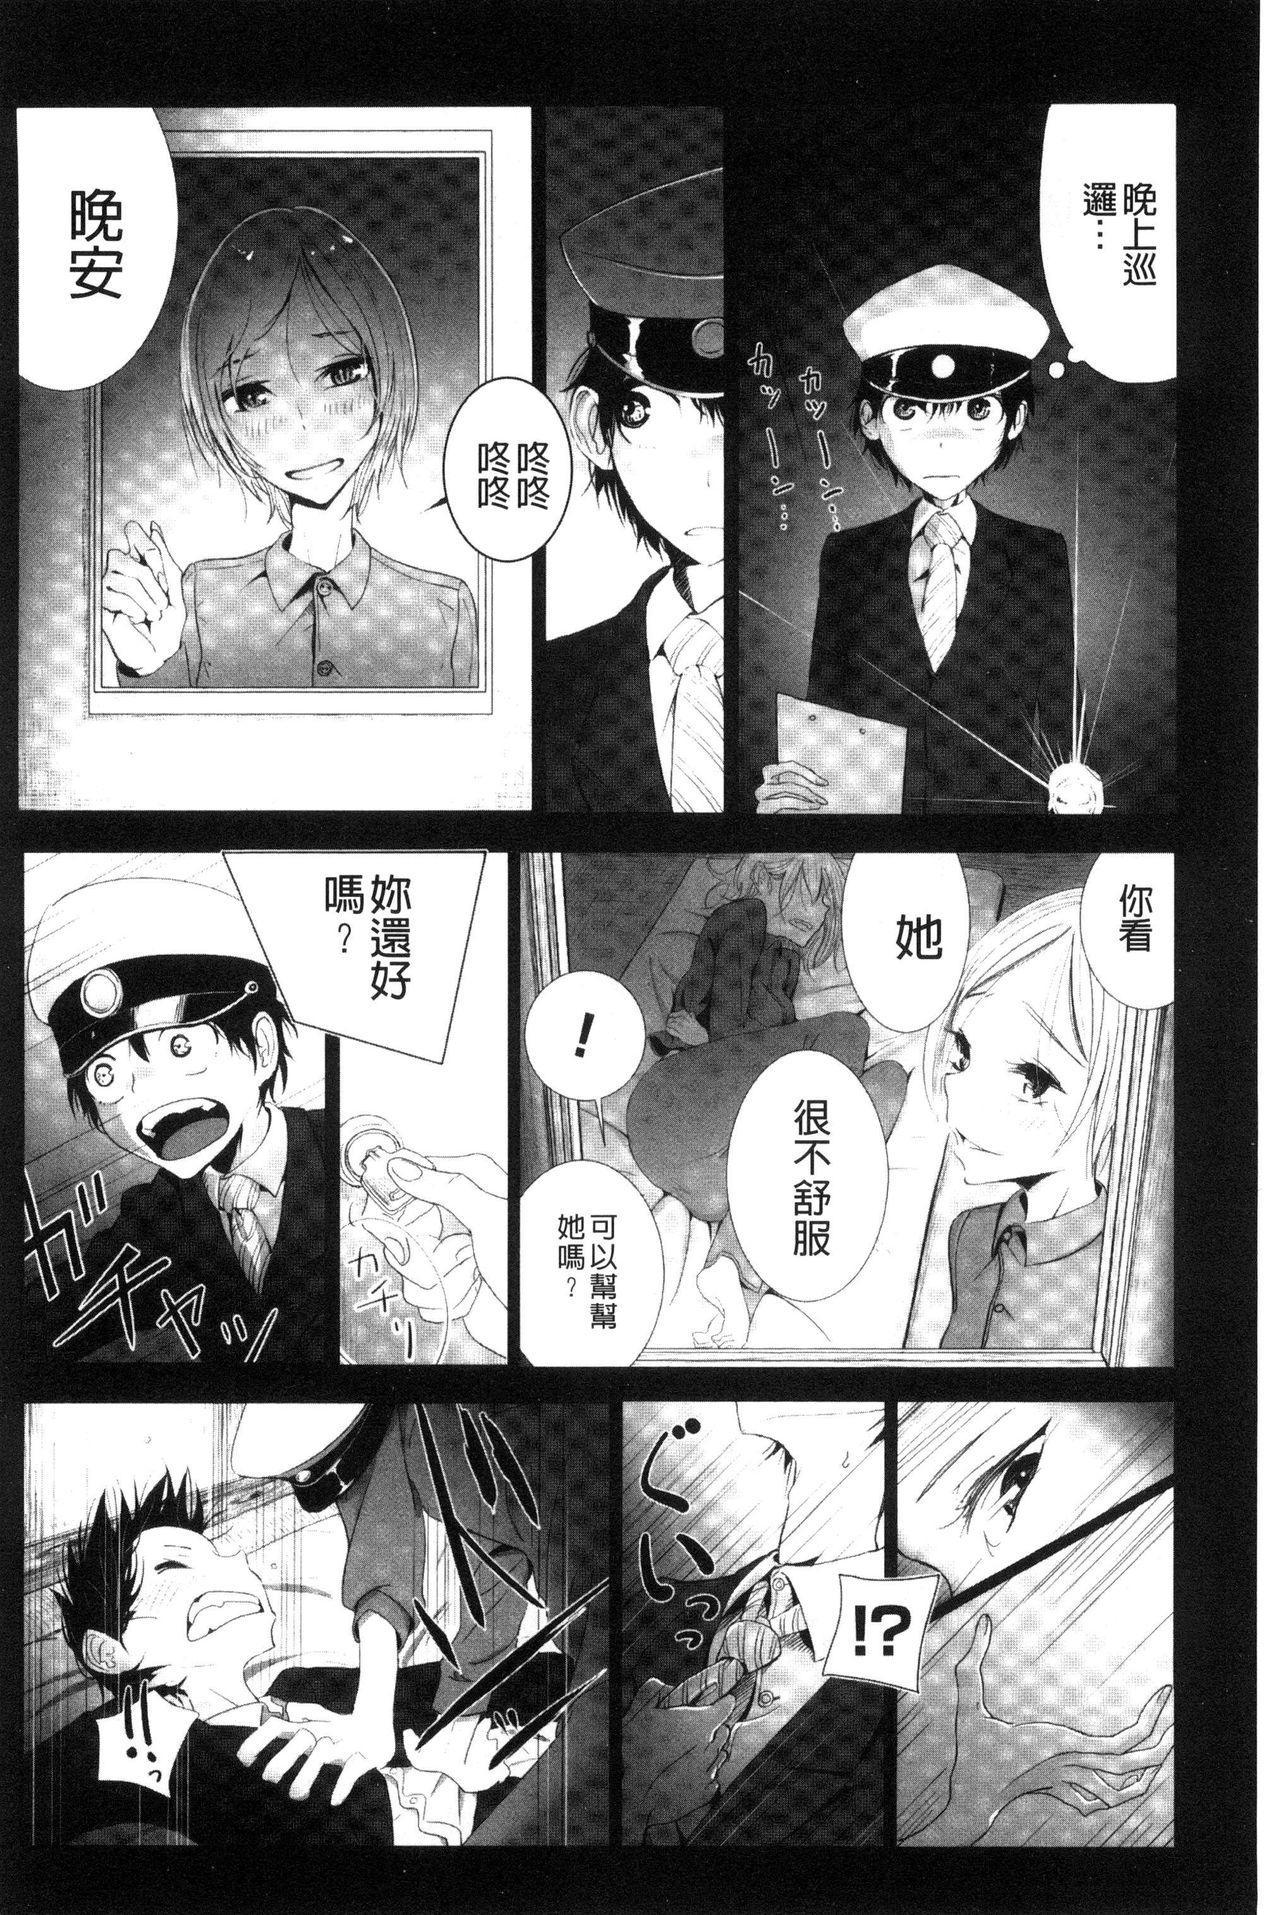 [Dhibi] Sono Yubisaki de Korogashite - Please Caress it at the Finger-tip. [Chinese] 159